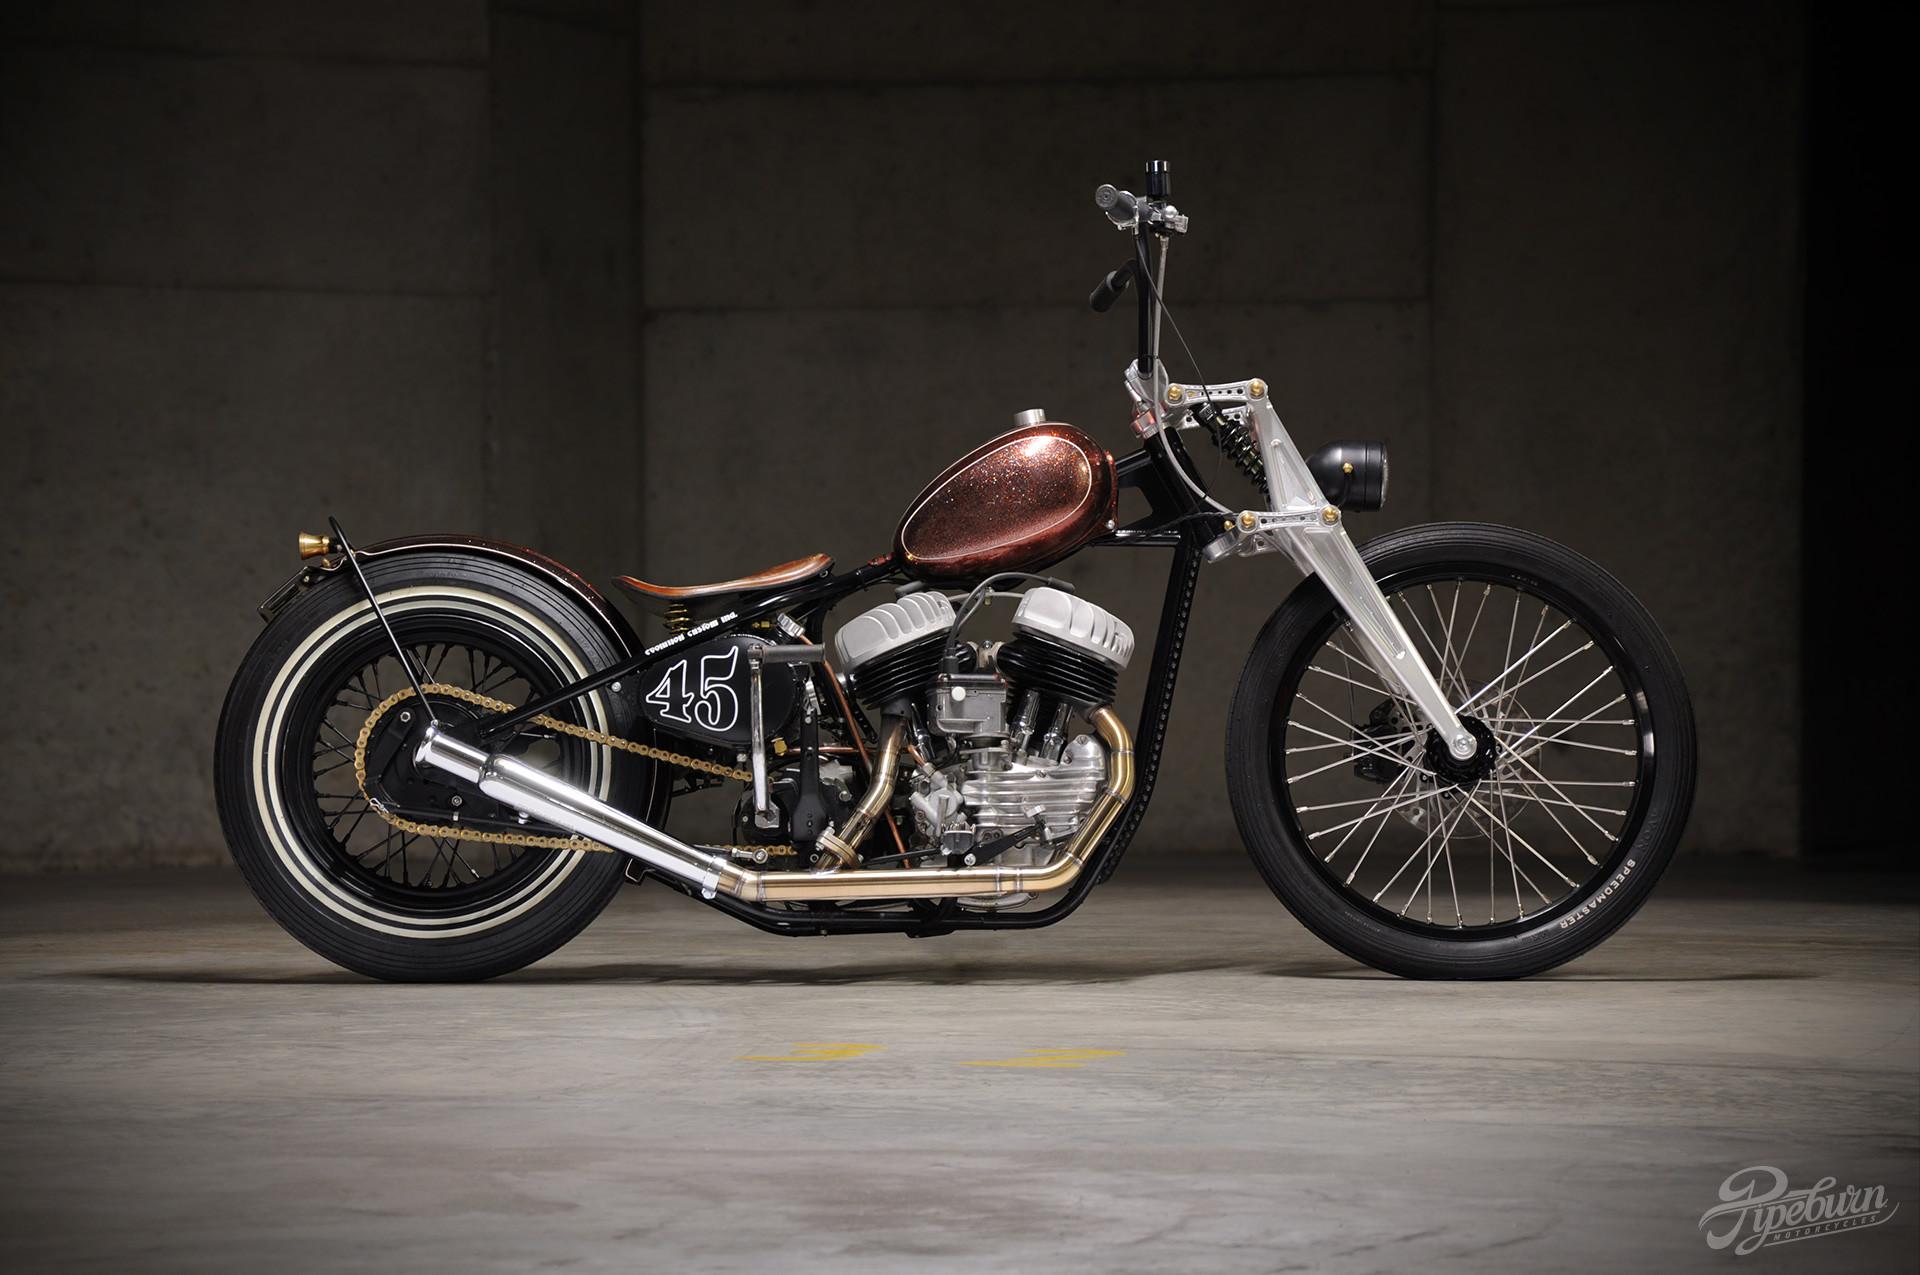 Res: 1920x1275, Harley Davidson Wallpaper High Definition